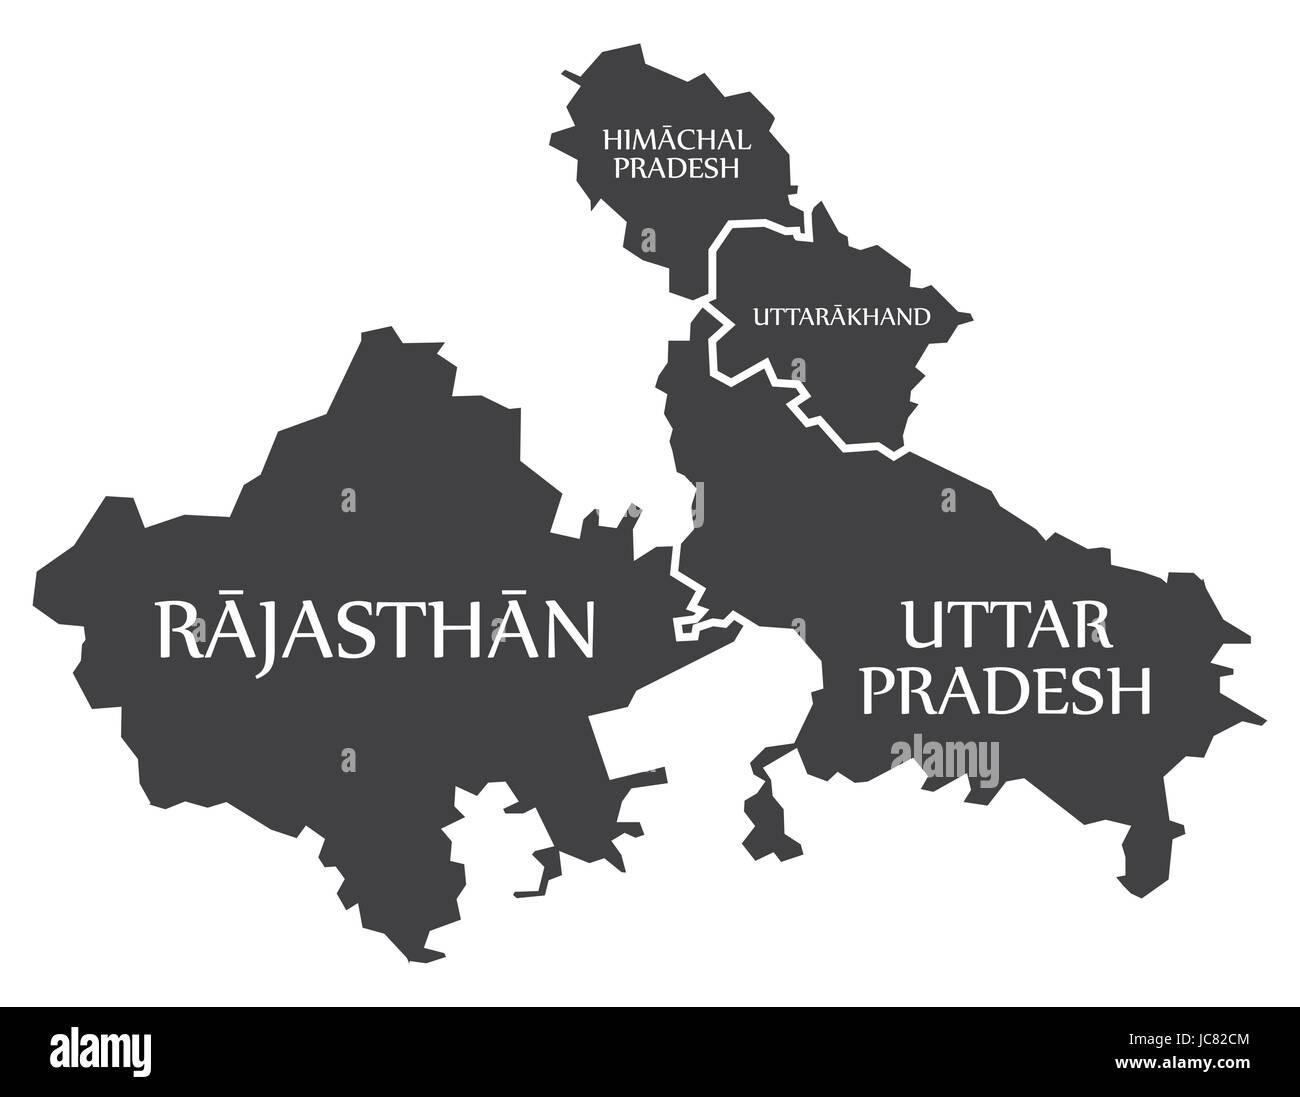 Rajasthan - Himachal Pradesh - Uttarakhand - Uttar Pradesh Map Illustration of Indian states - Stock Vector